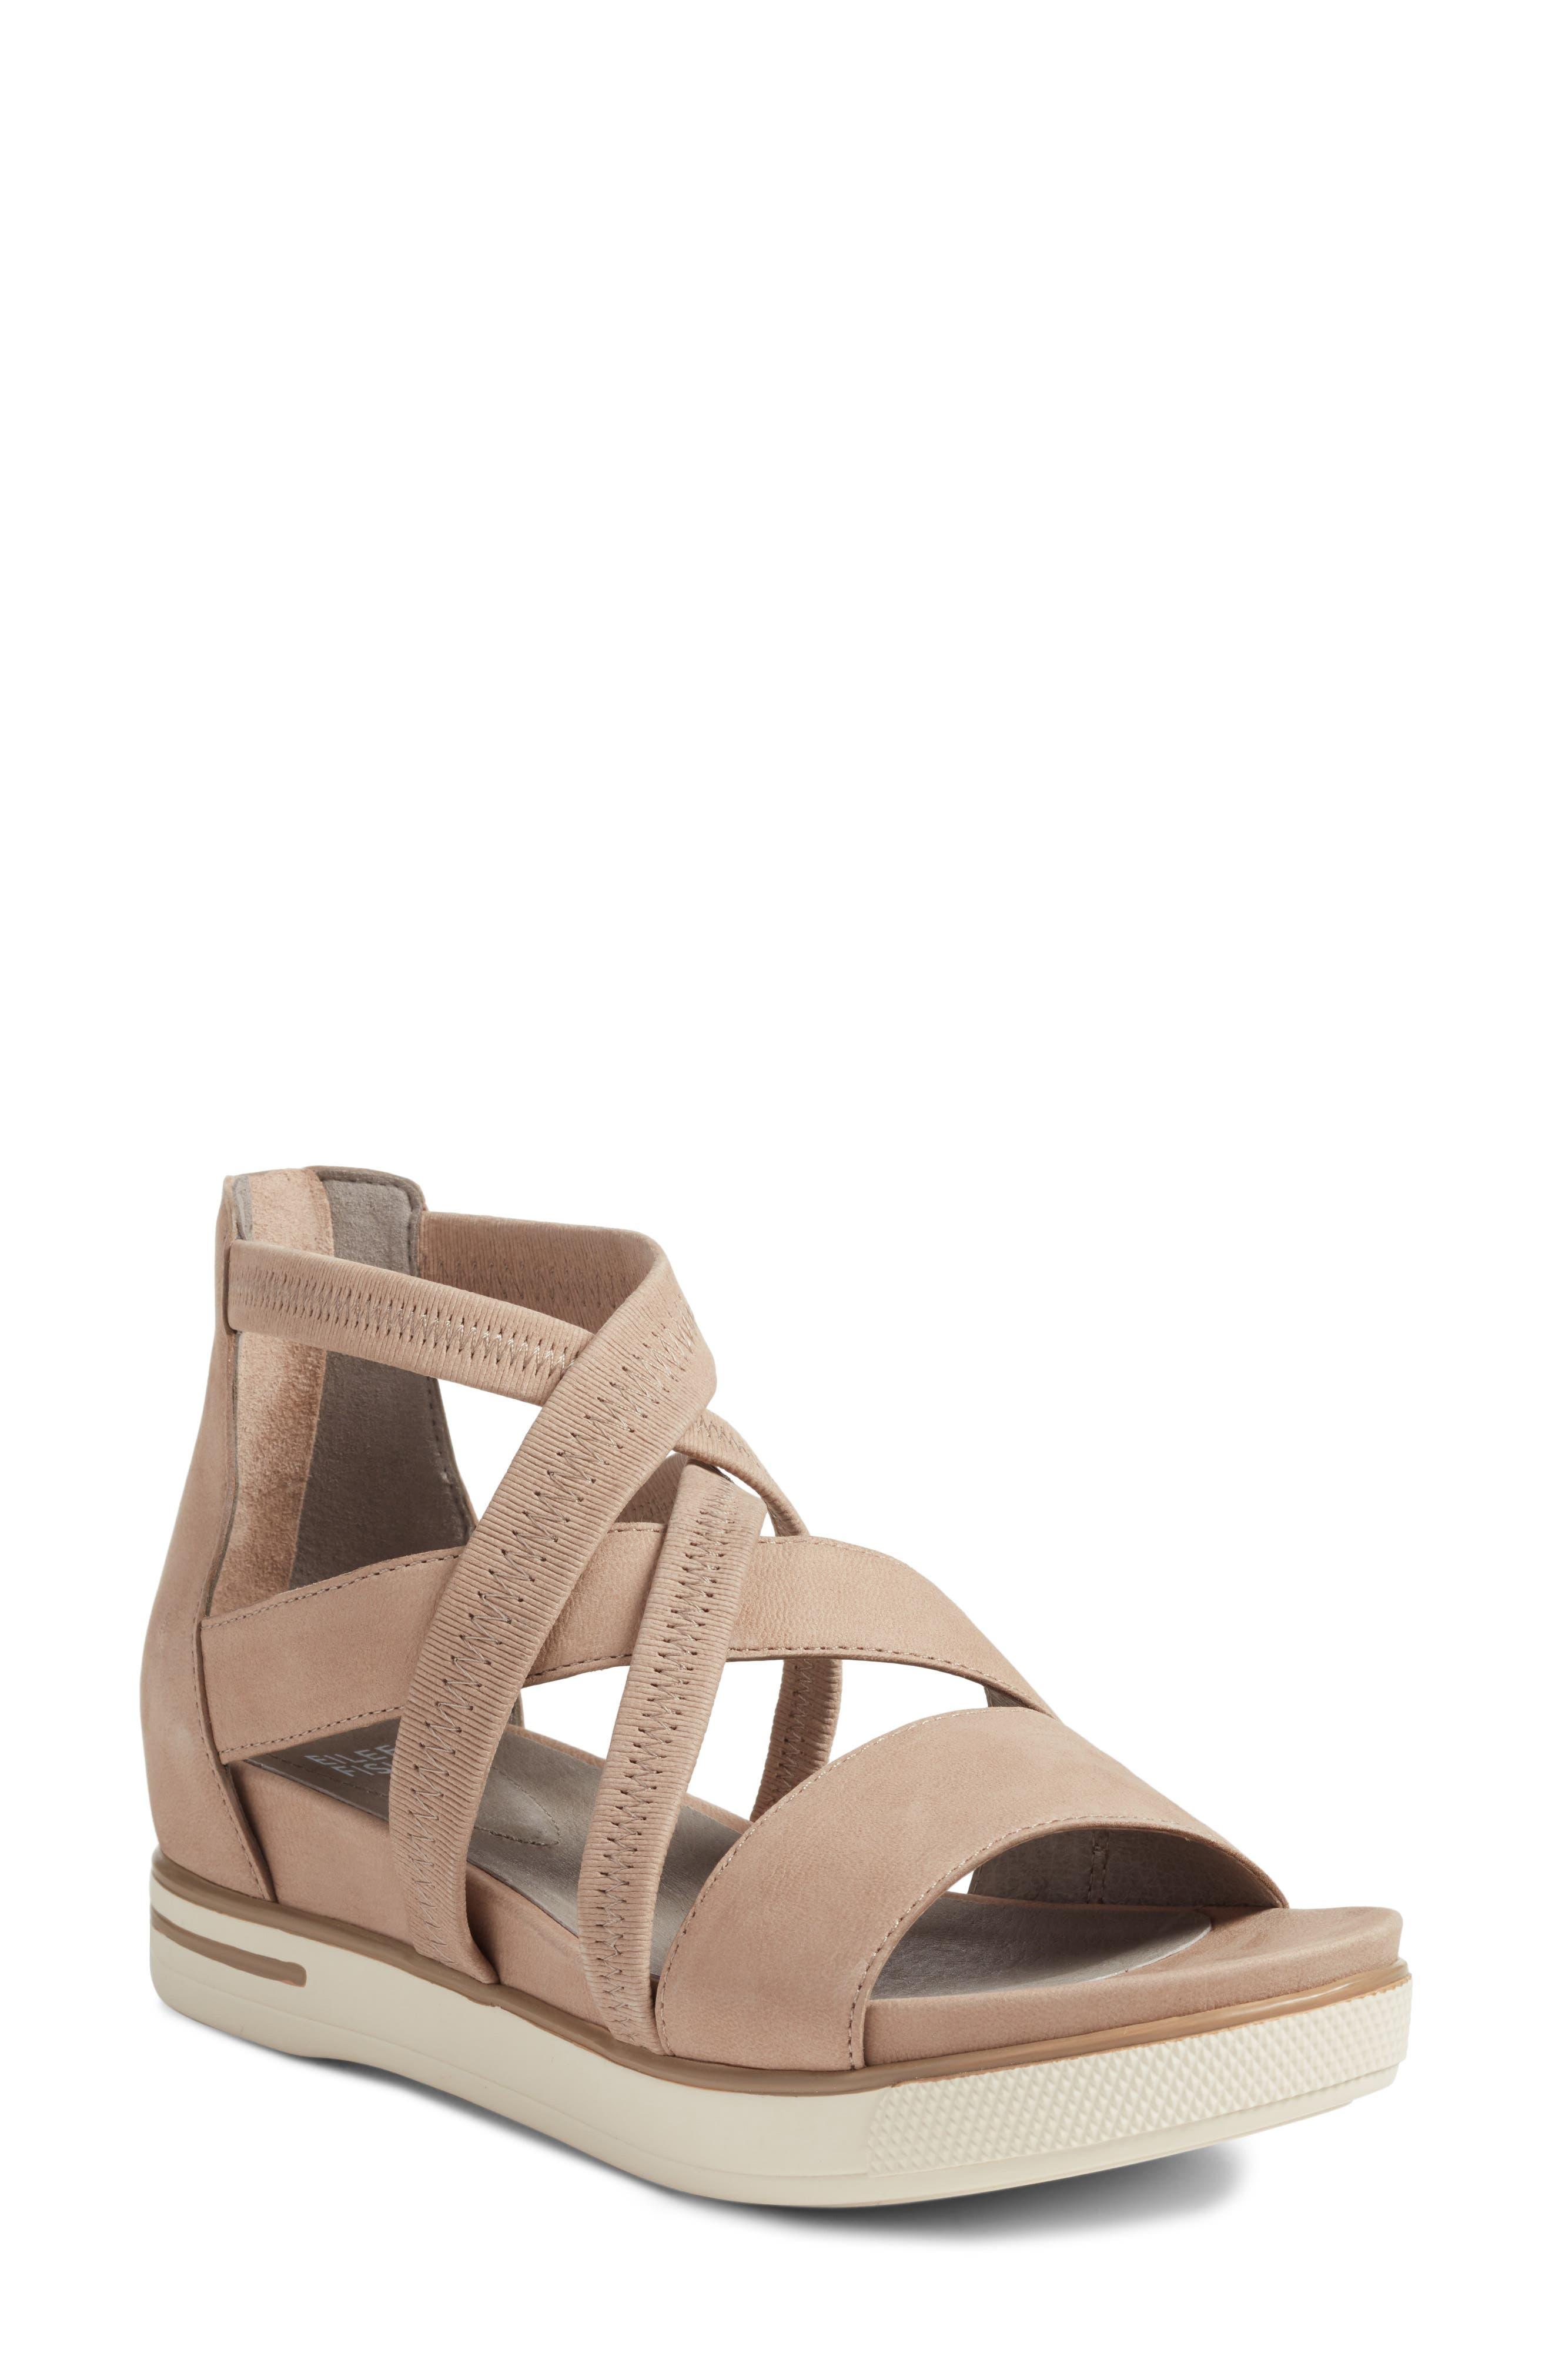 les sandales: vente vente sandales: | nordstrom 35f61e